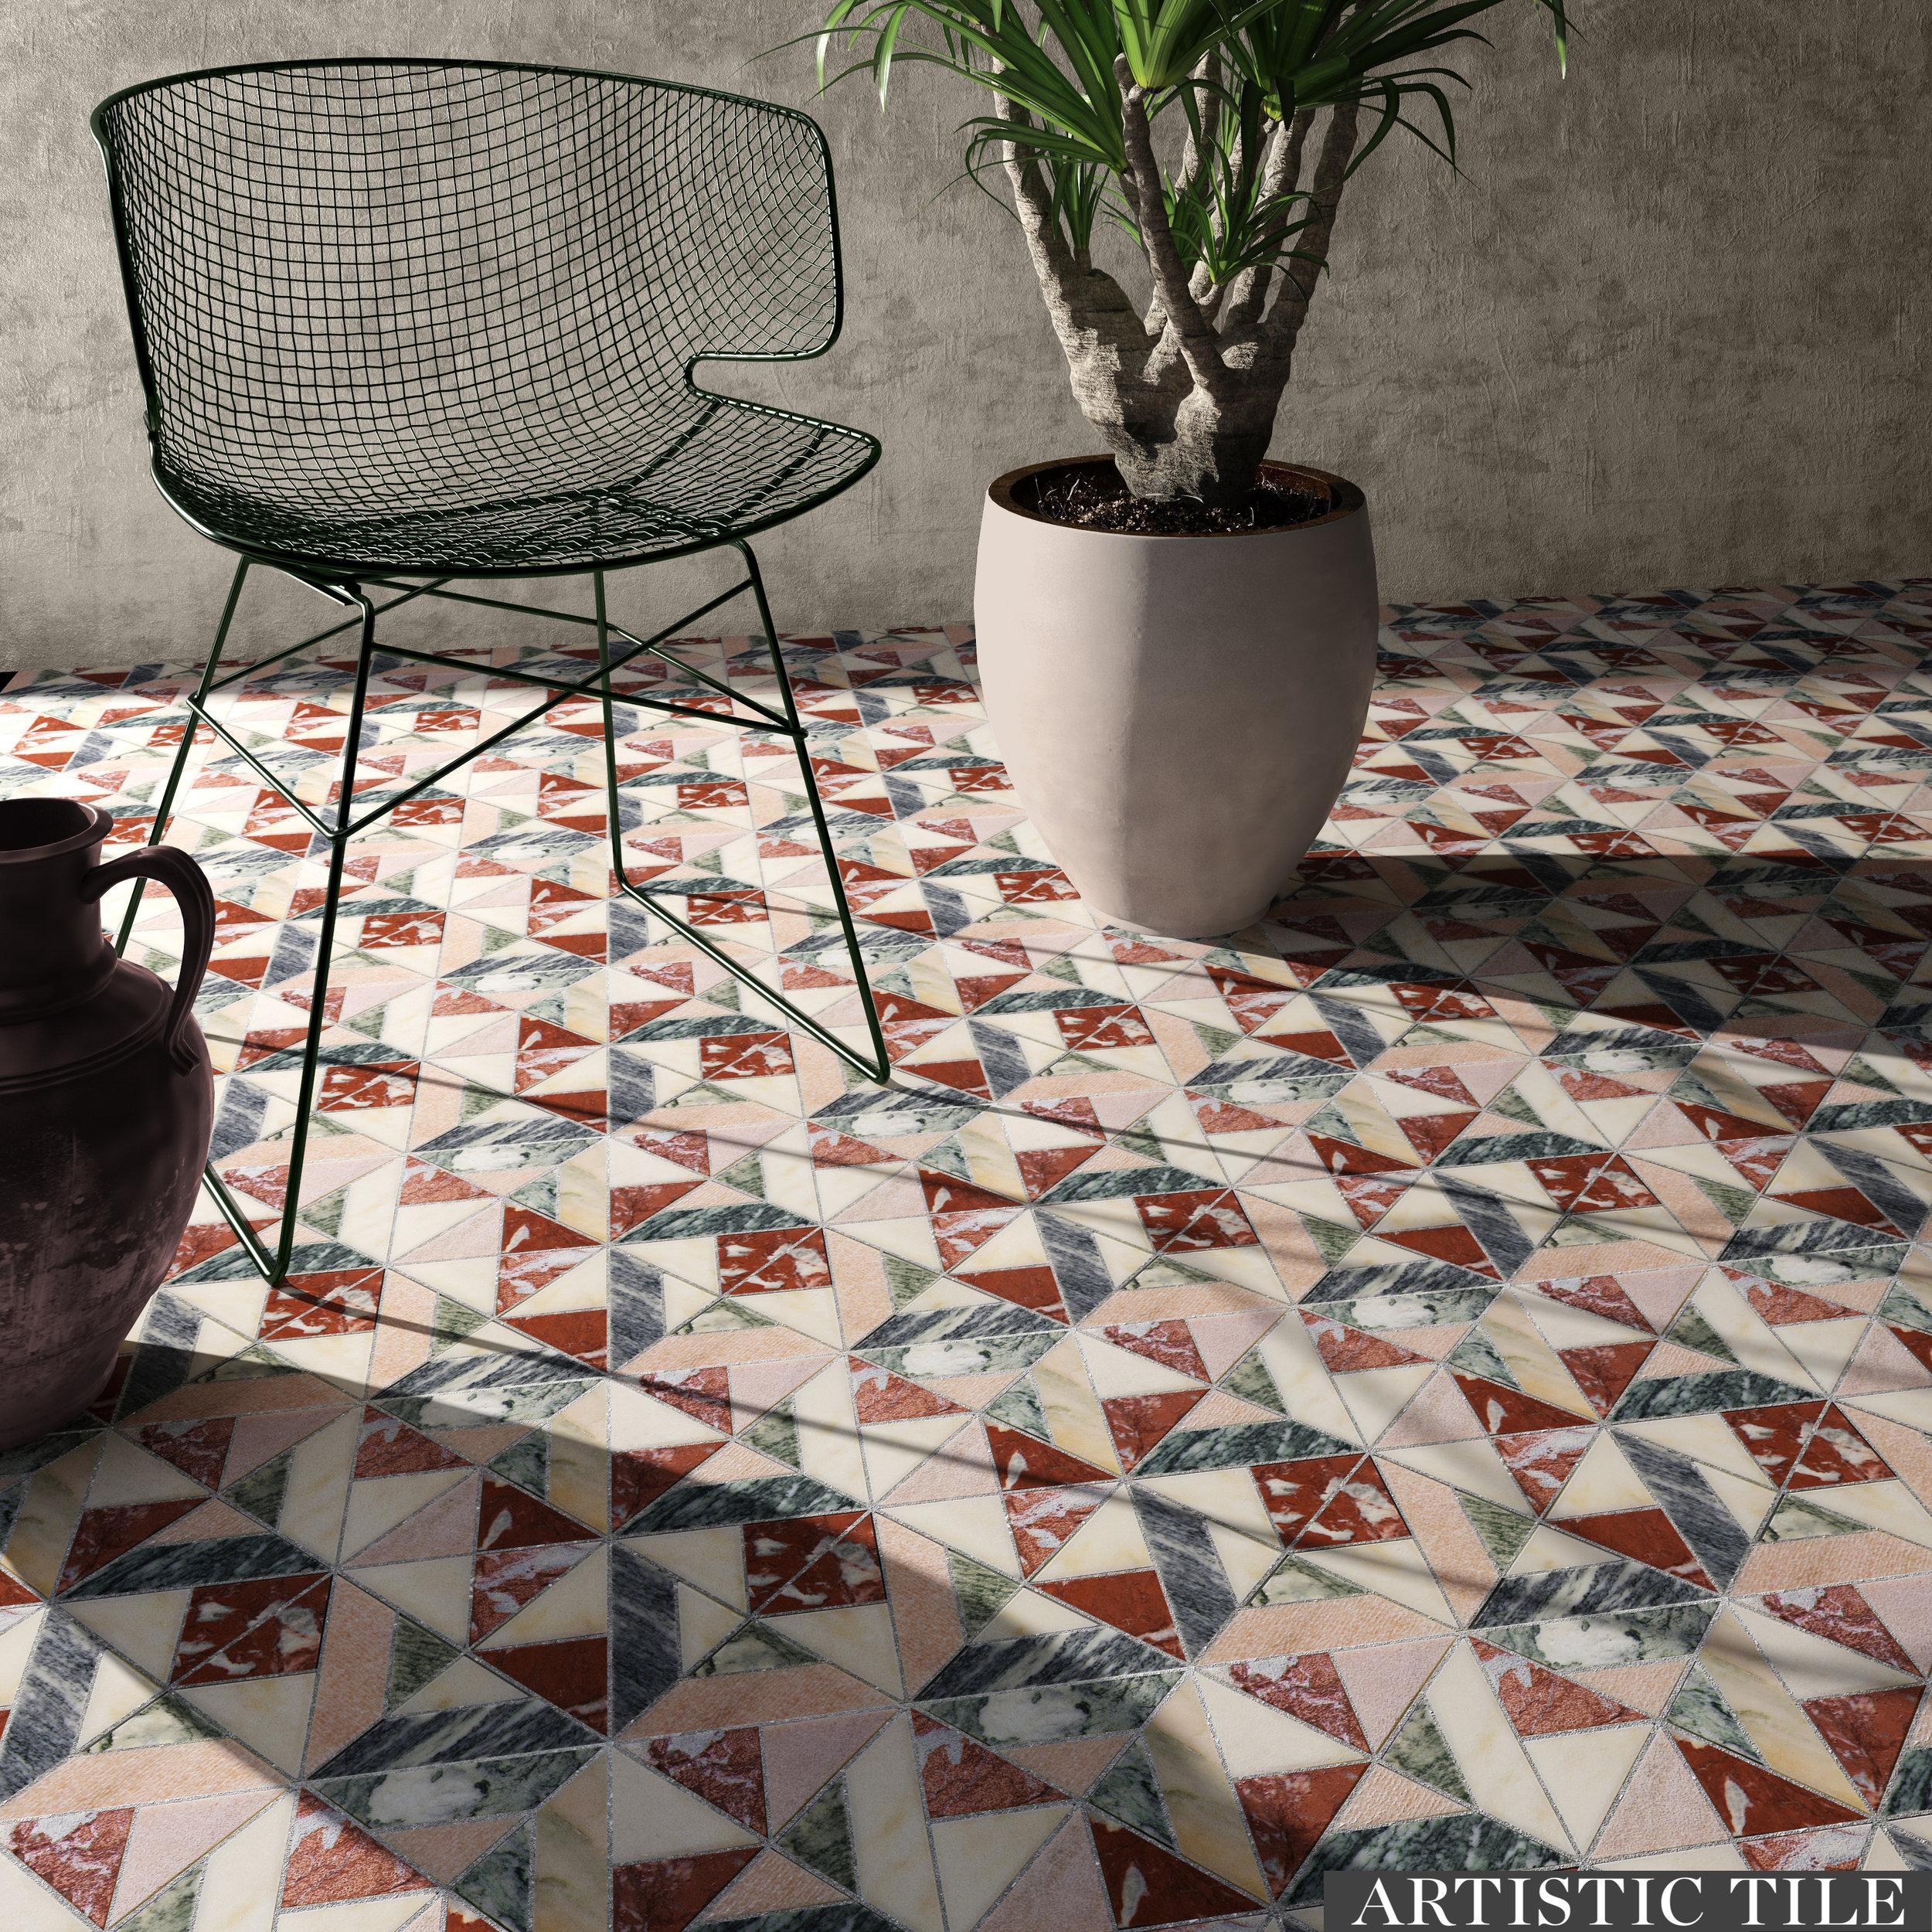 ART - Artistic - Weston Fete - Mosaic - Living Areas.jpg